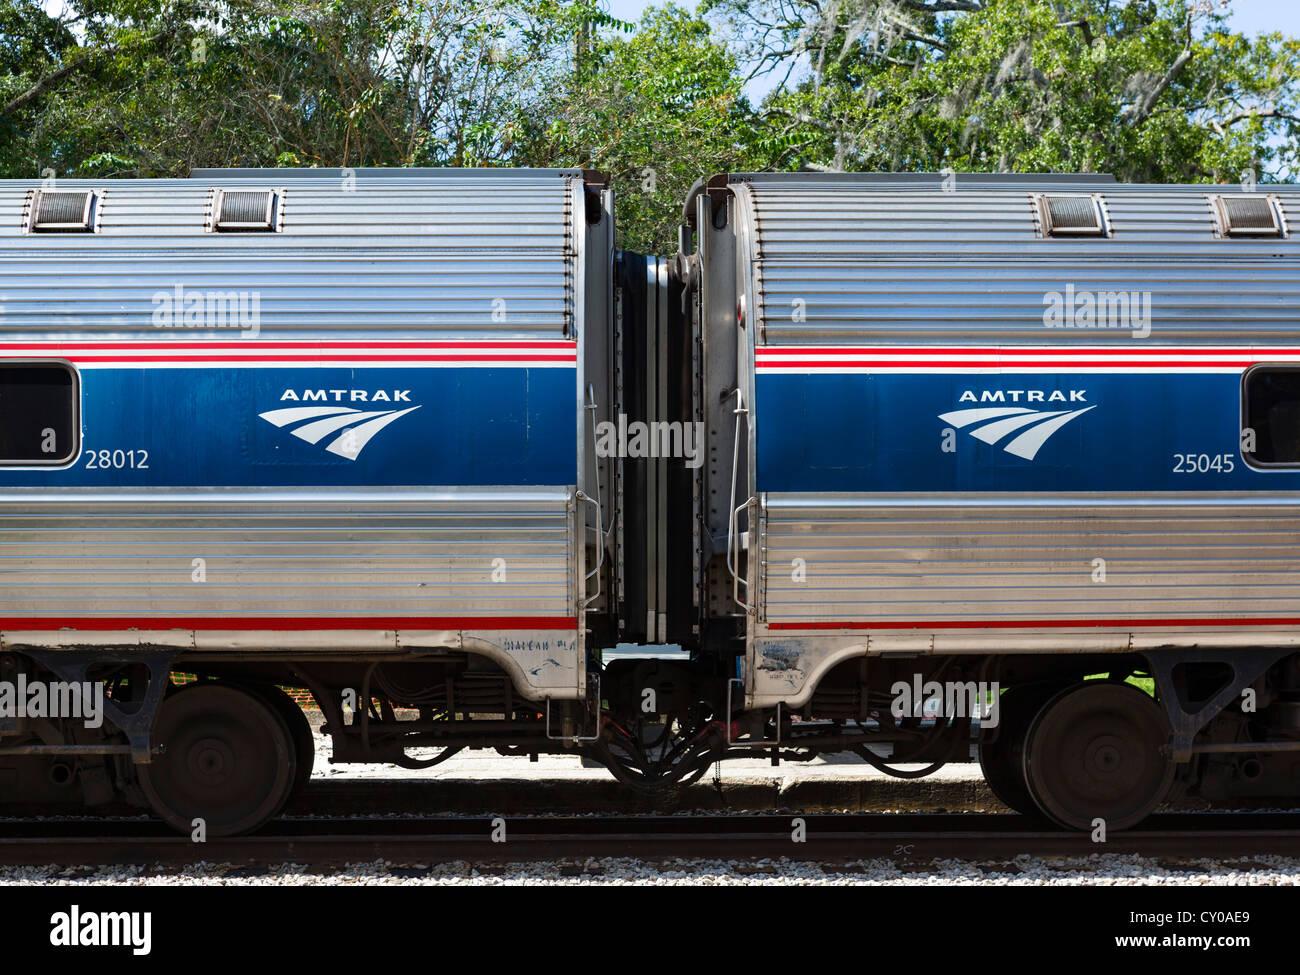 Amtrak passenger rail coaches, Florida, USA - Stock Image